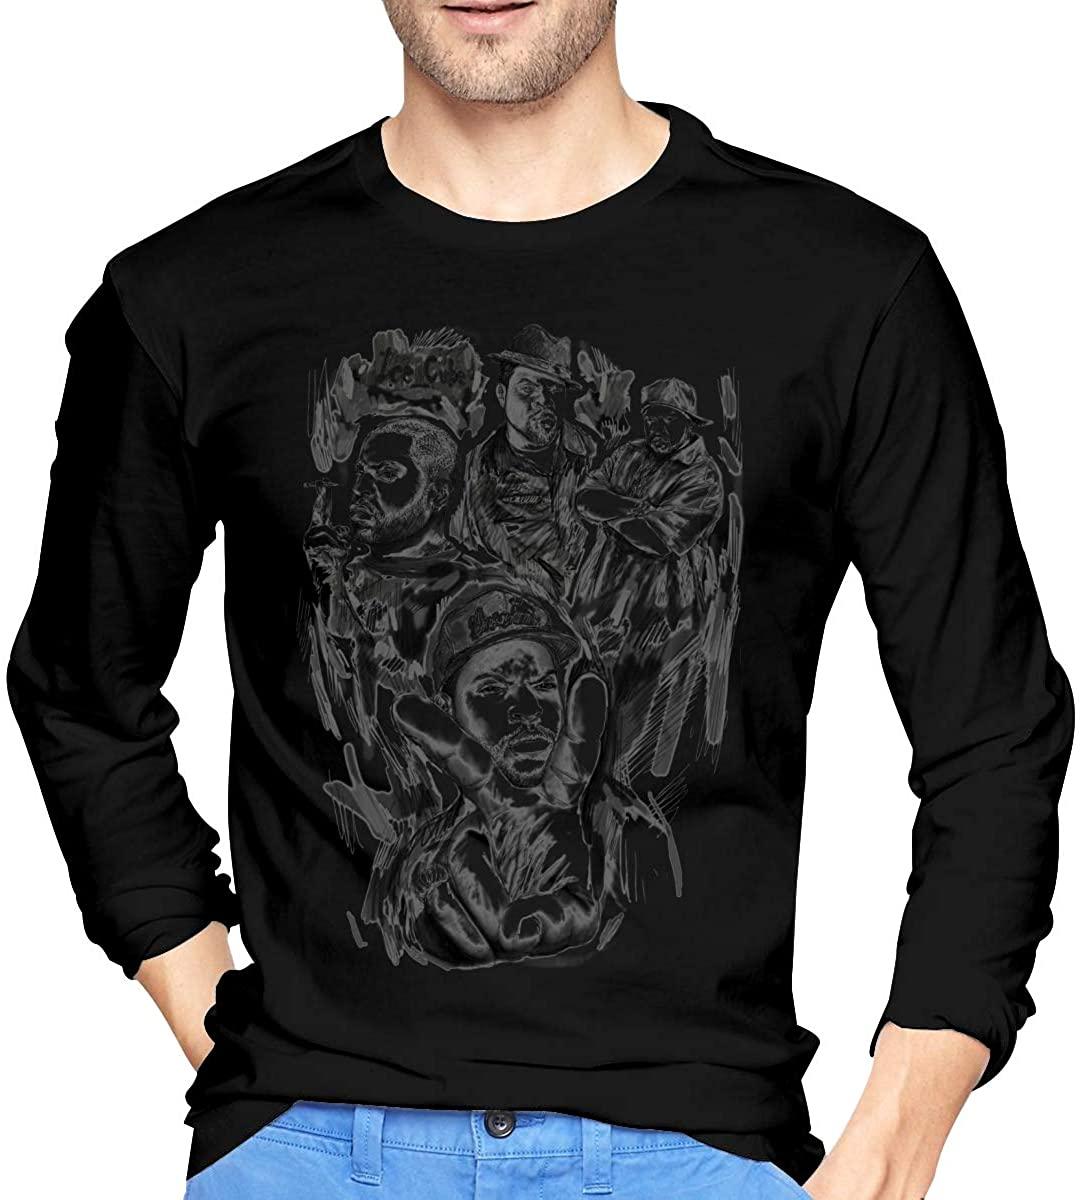 JeccLife ICE Cube Mens Long Sleeve T-Shirt Cotton Round Neck Shirt Black